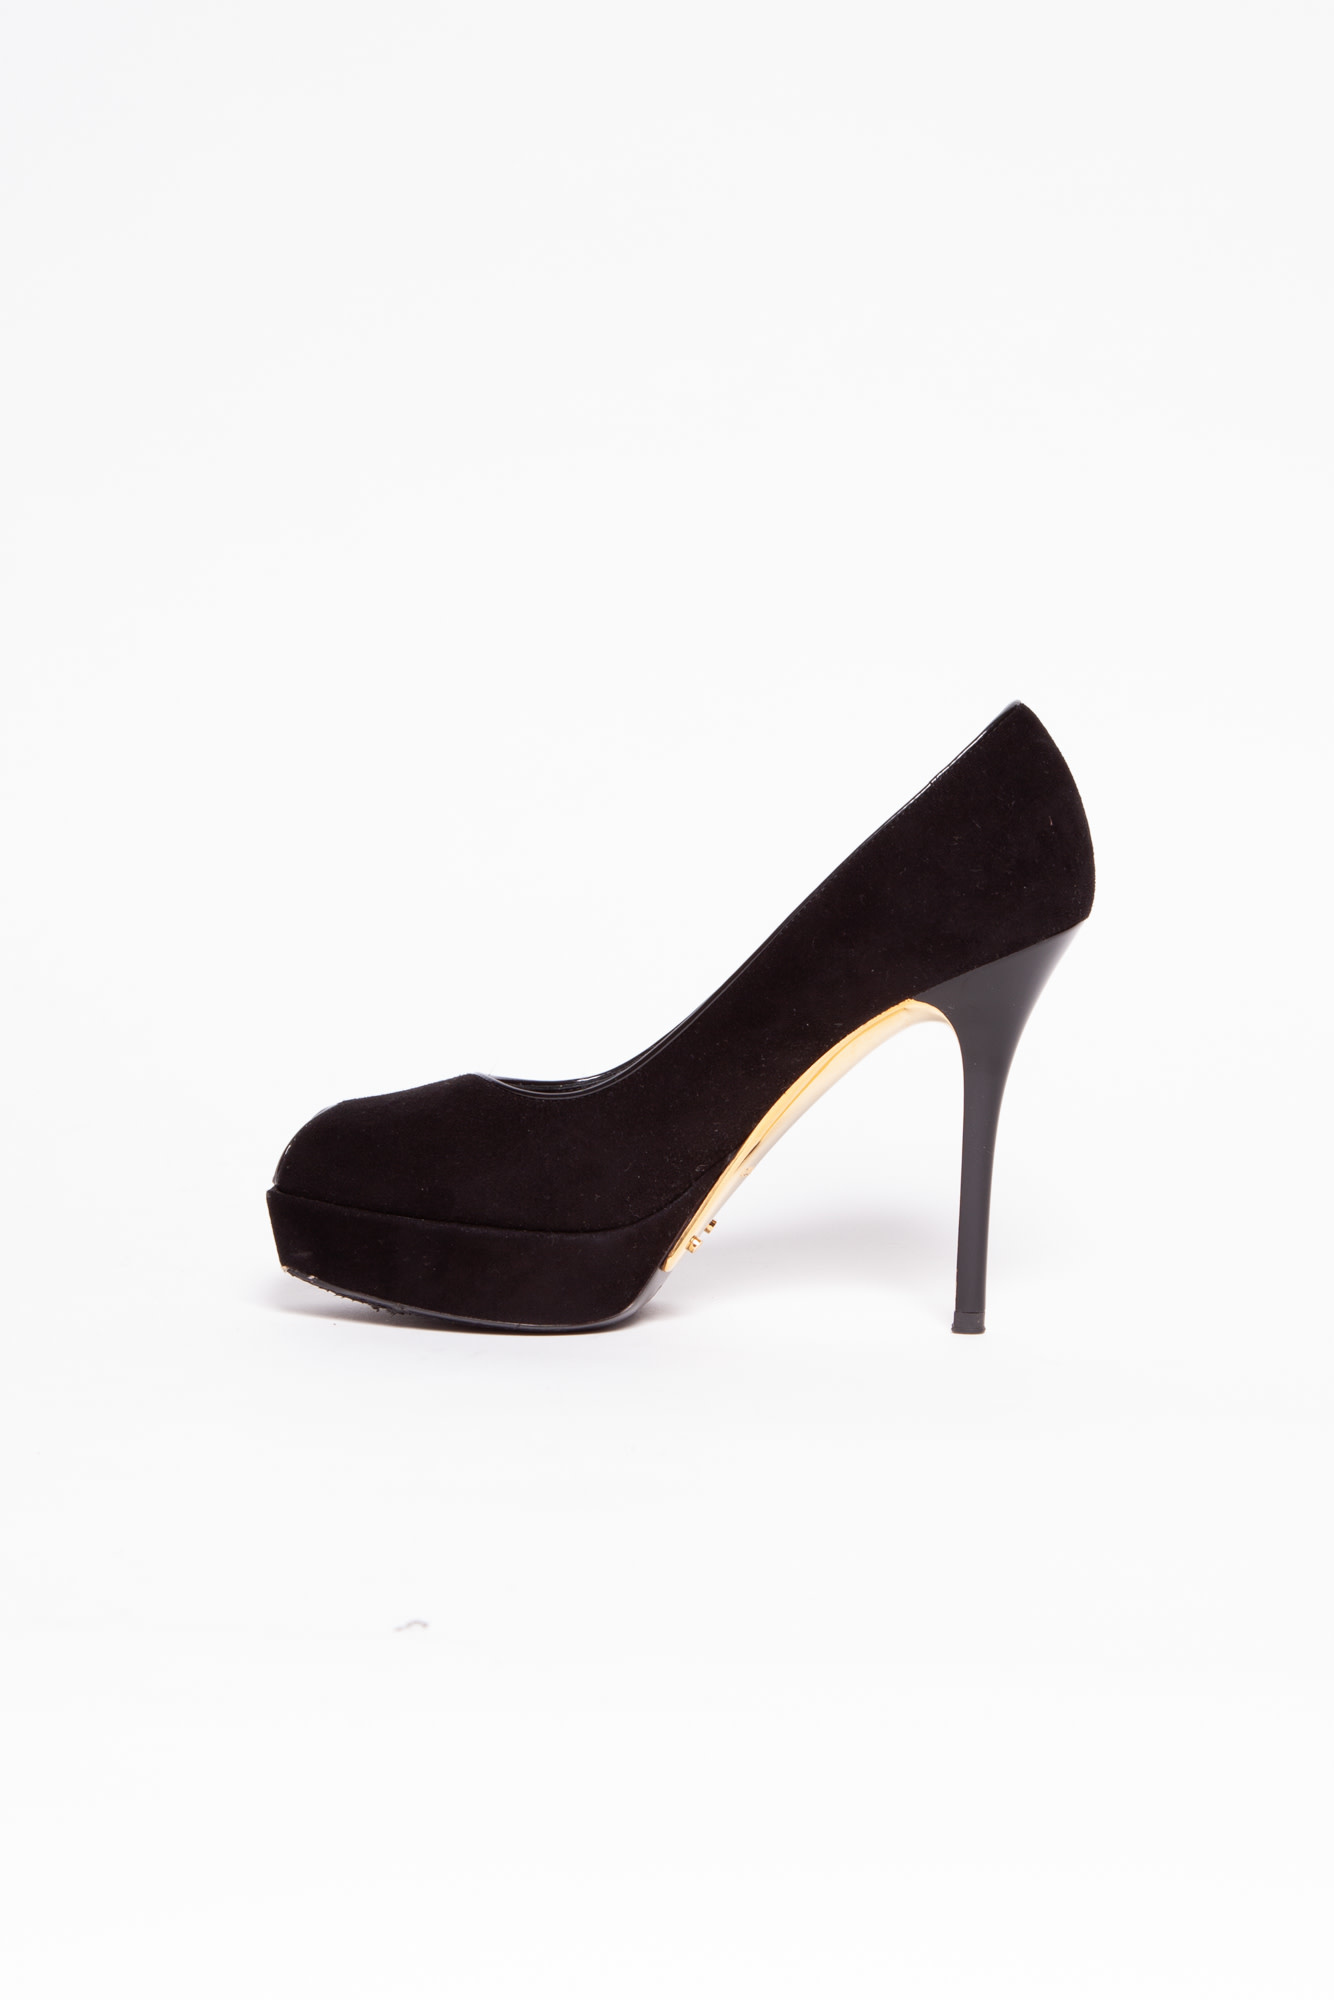 Louis Vuitton BLACK PUMPS OPEN-TOE IN SUEDE